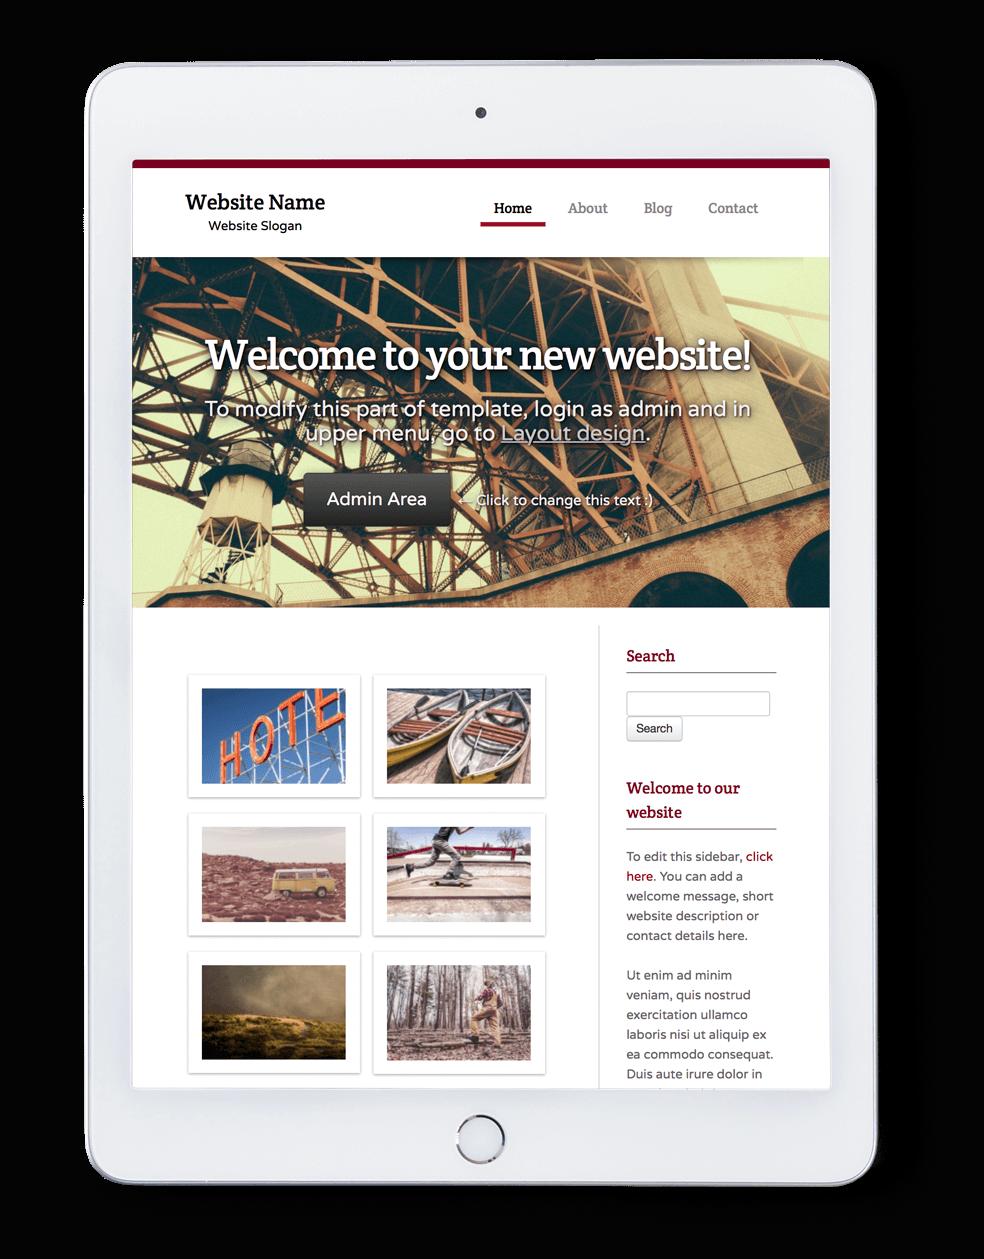 website-1 New Home